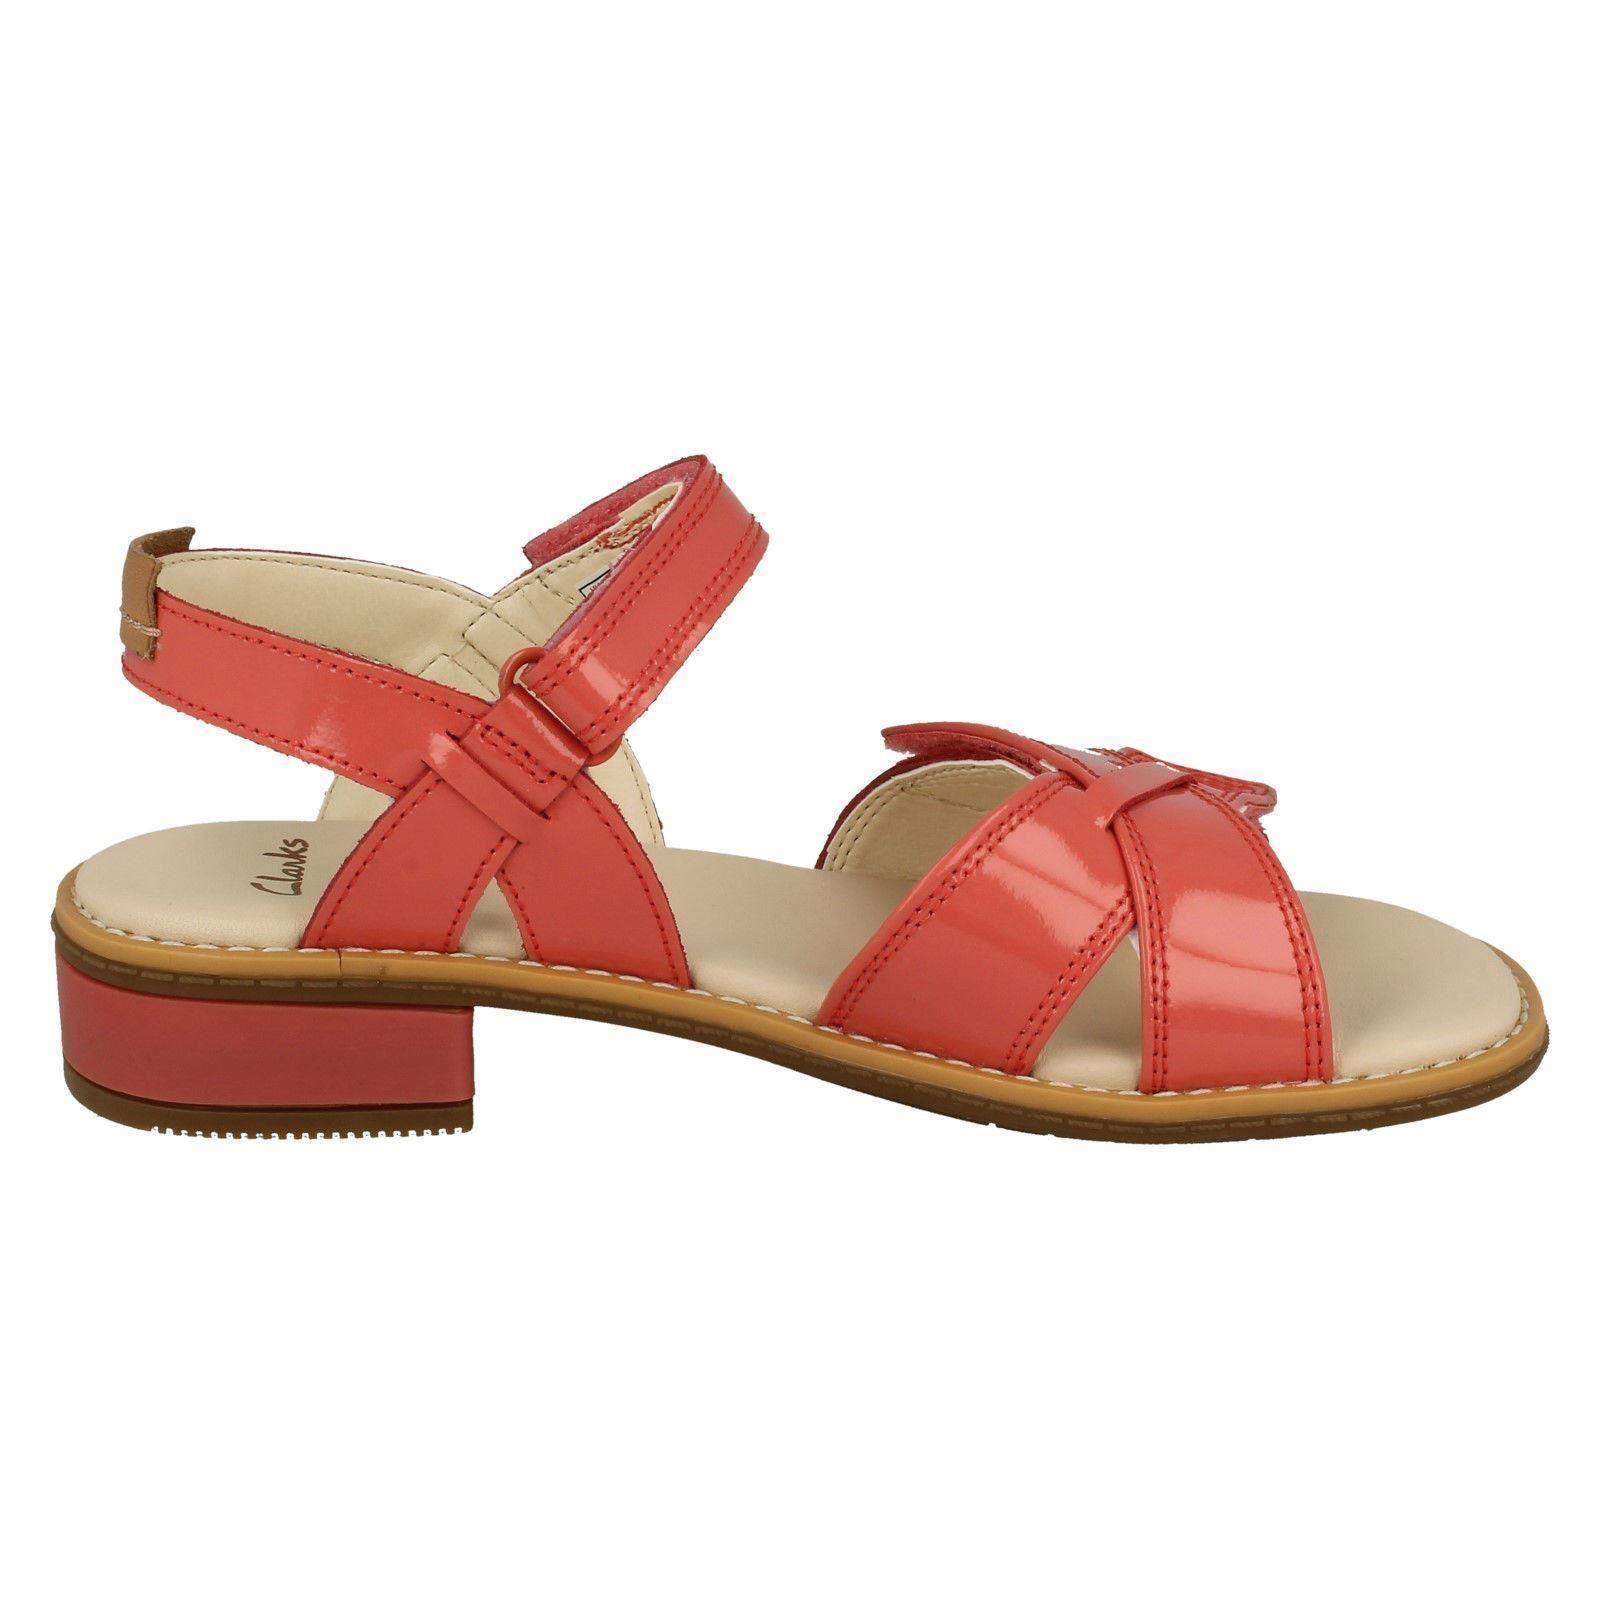 Girls Clarks Strappy Sandals Darcy Charm